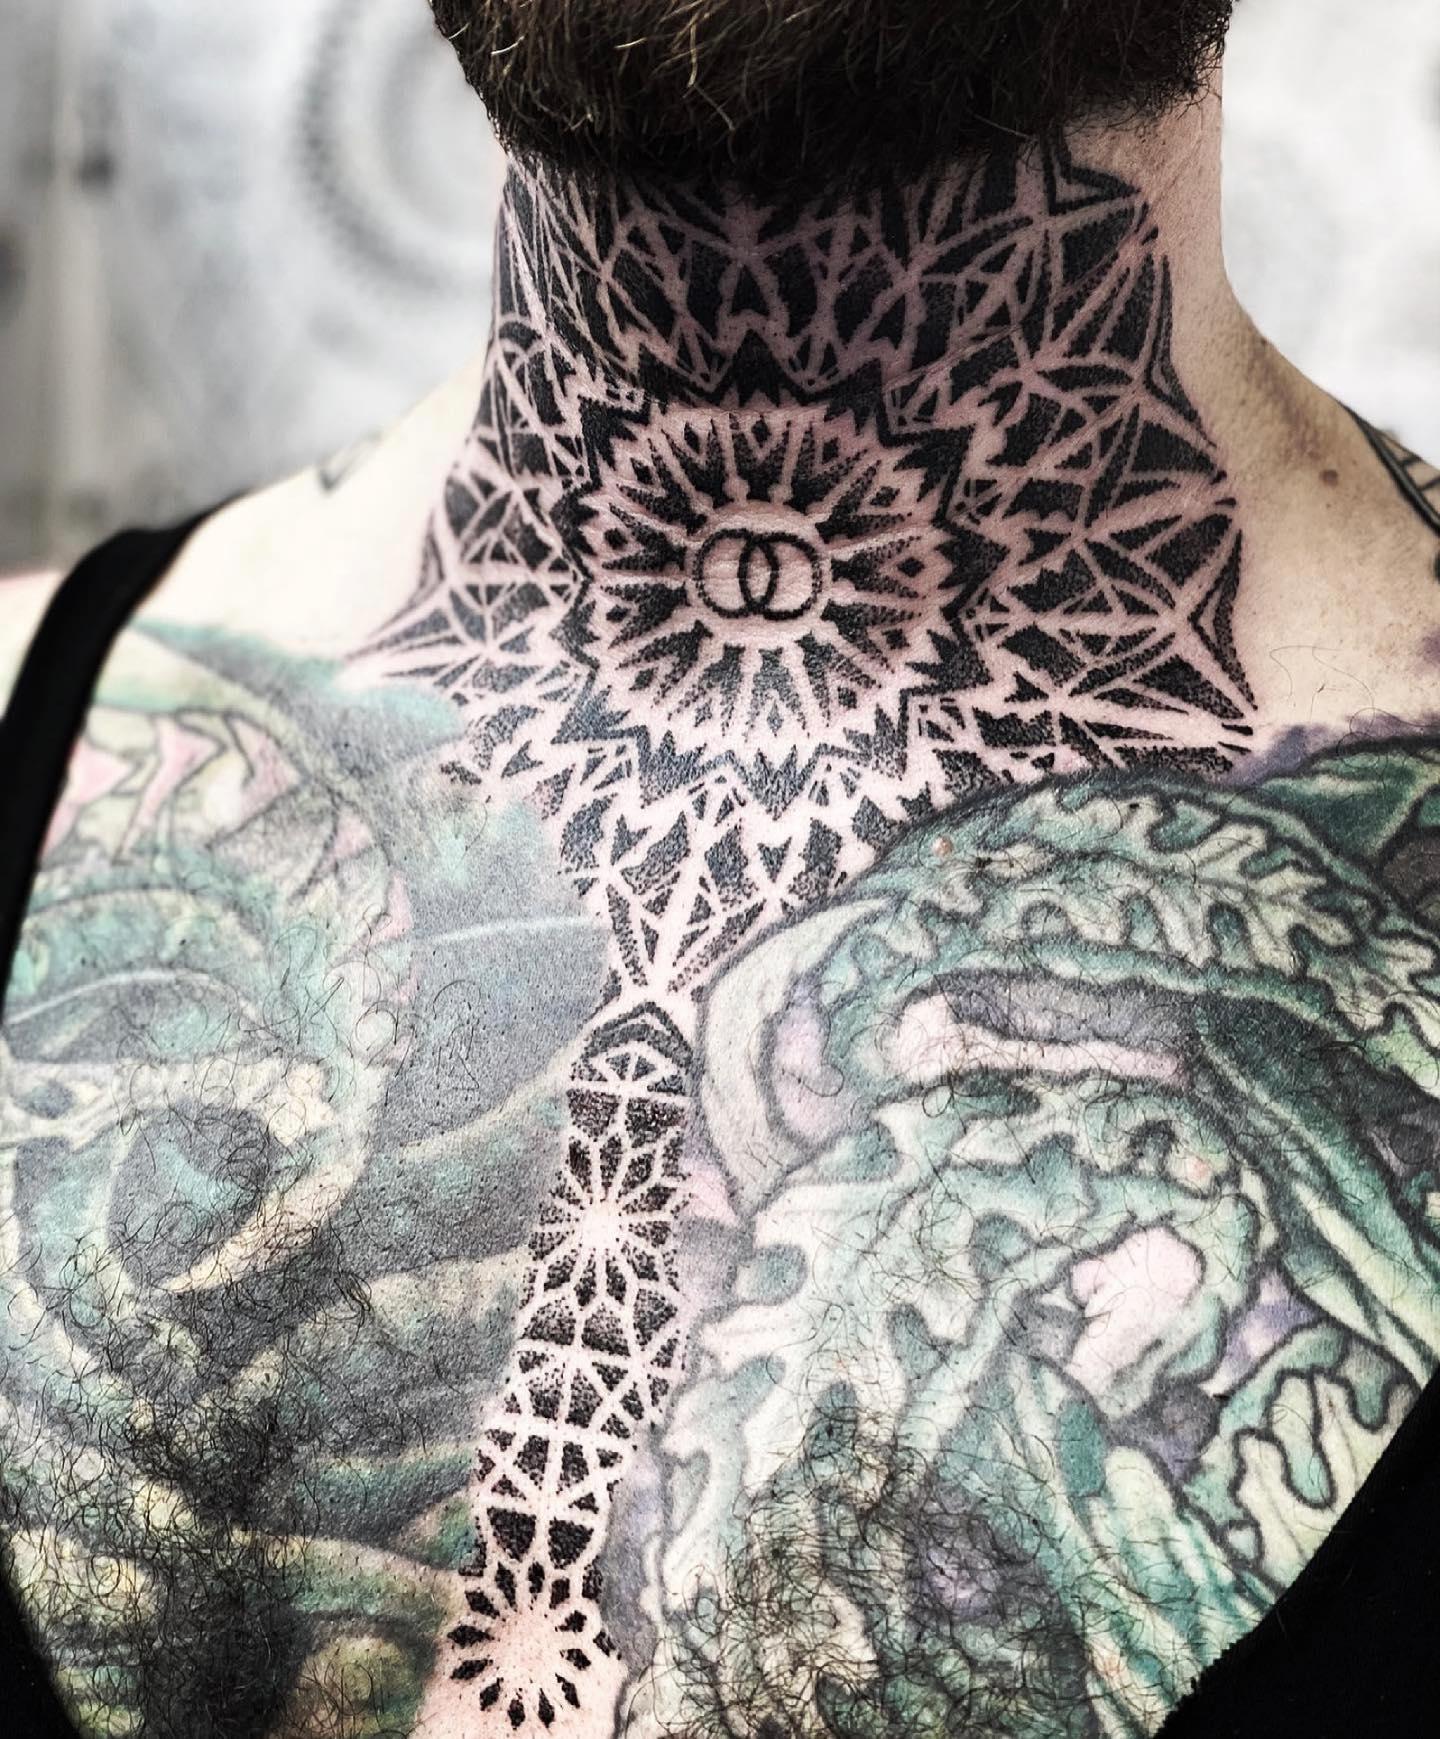 Crazy intricate dotwork from the mandala master marcdiamondtattoo prelockdown ❄️❄️ • • •      dotworktattoo      totaltattoo